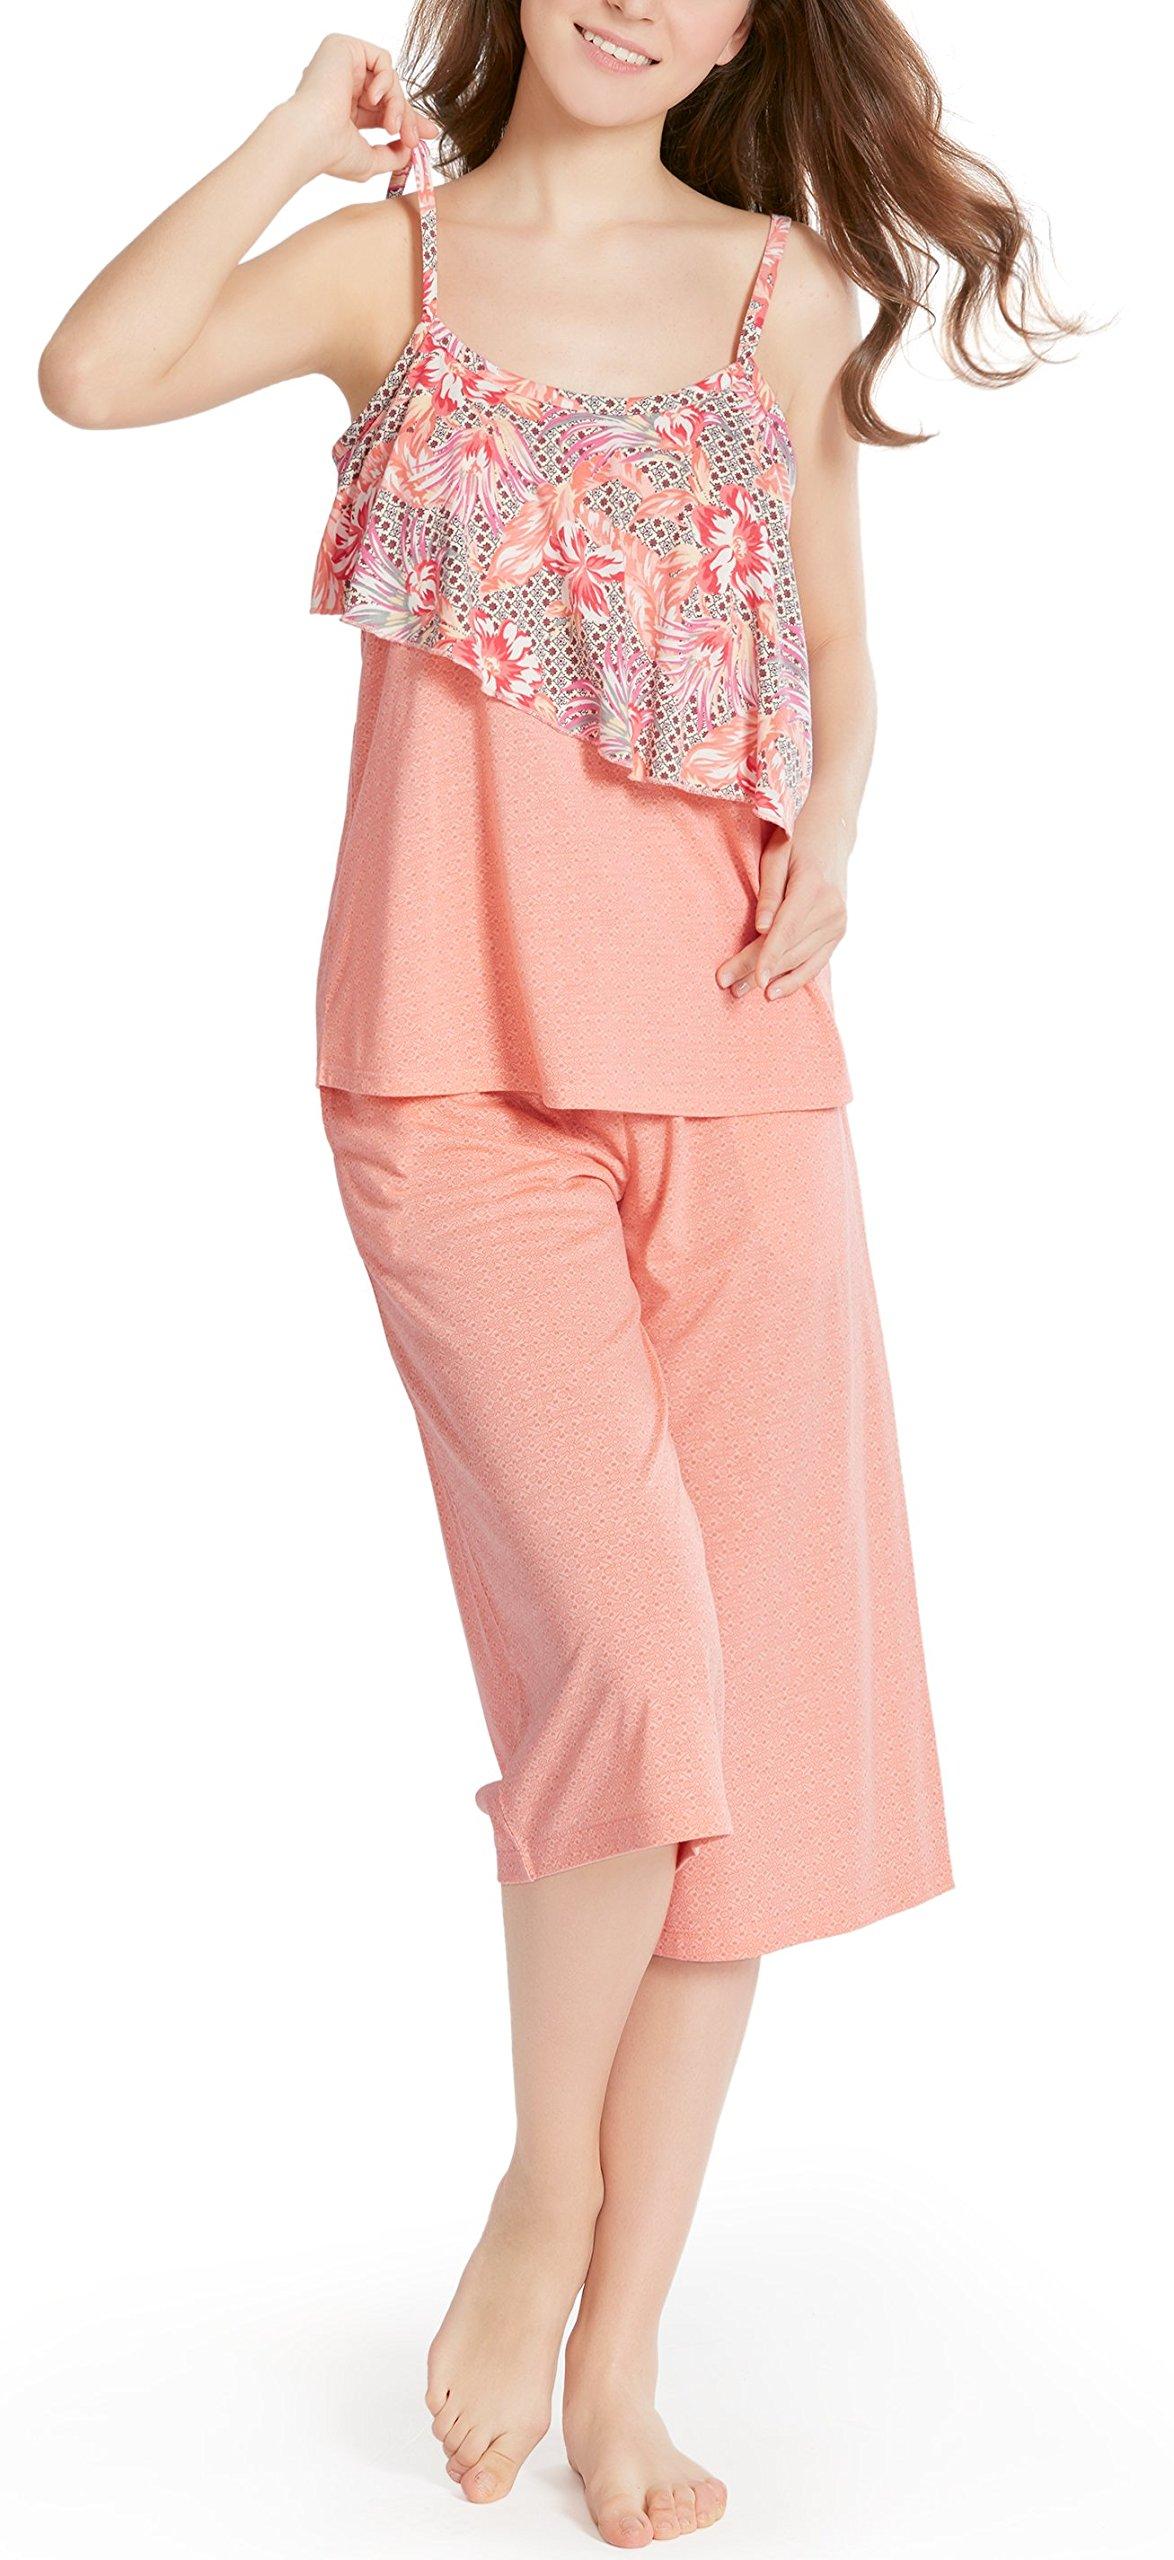 Summer Pajamas for Women, Camisole Capri Pajama for Woman - Pjs Women Tank Tops Lounge Capris Sets Bermuda XXL